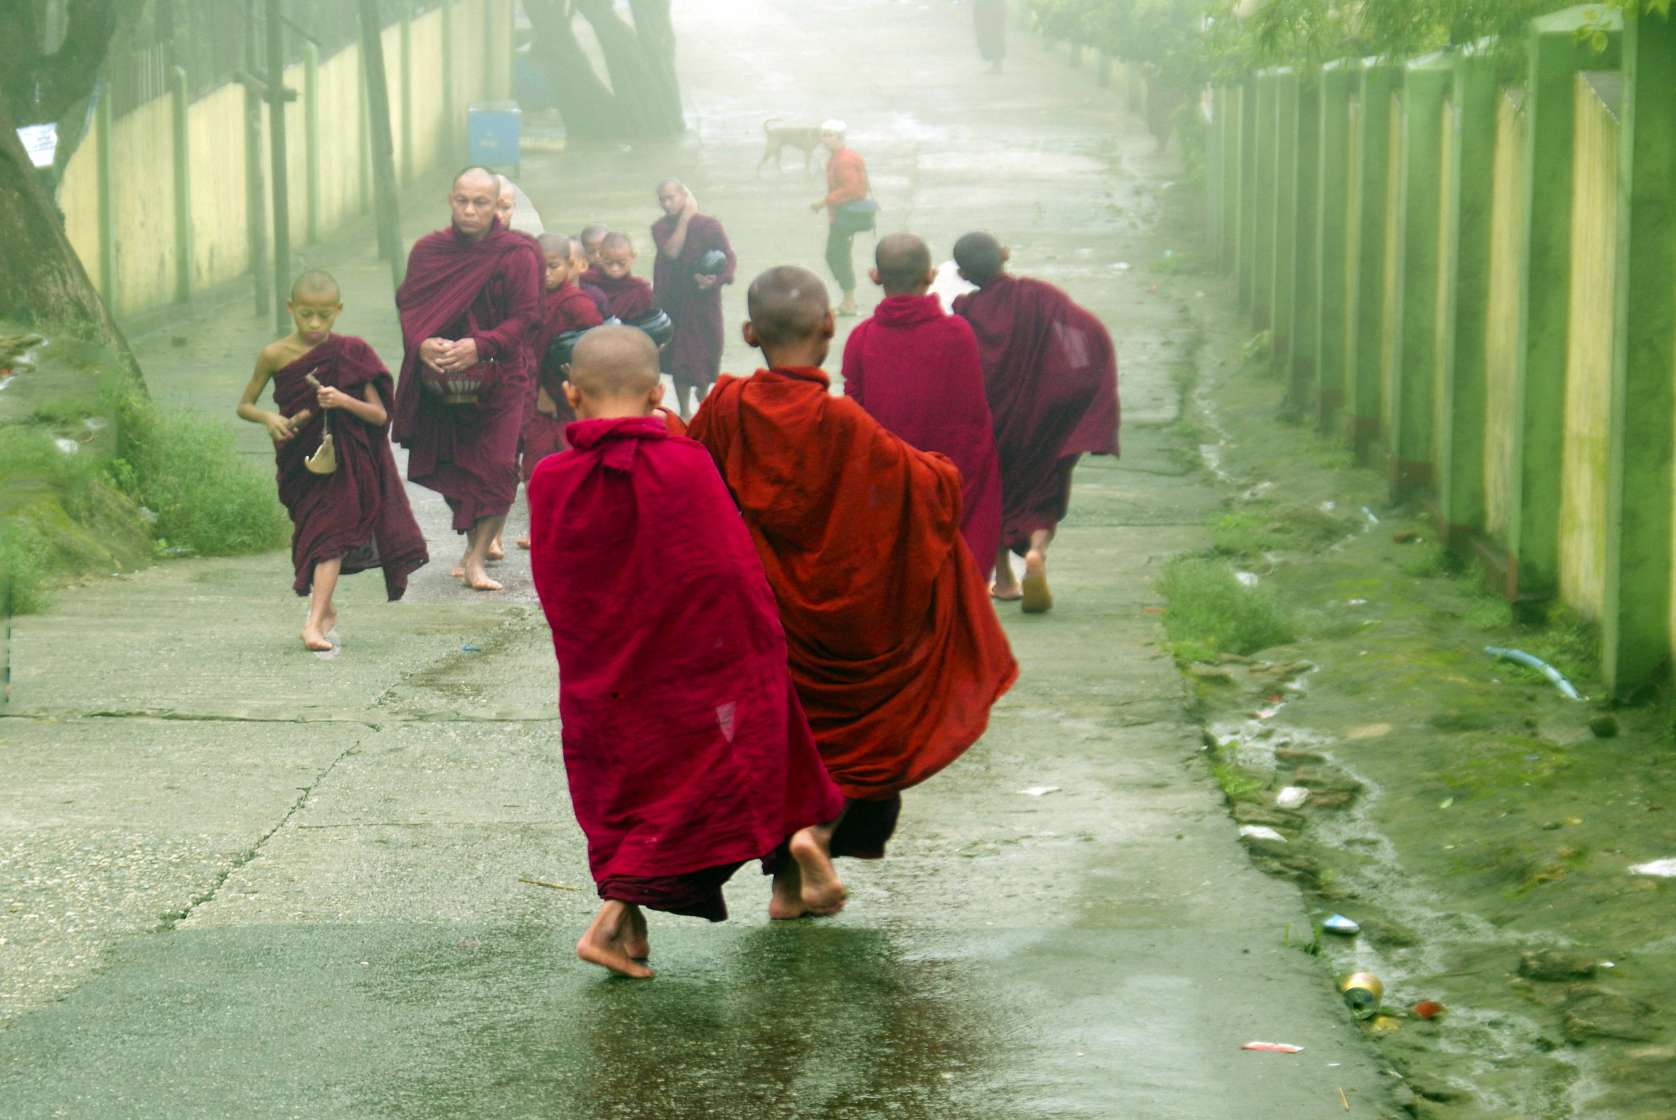 DÍA 4 : Mandalay, Mingun, Ava, Mandalay